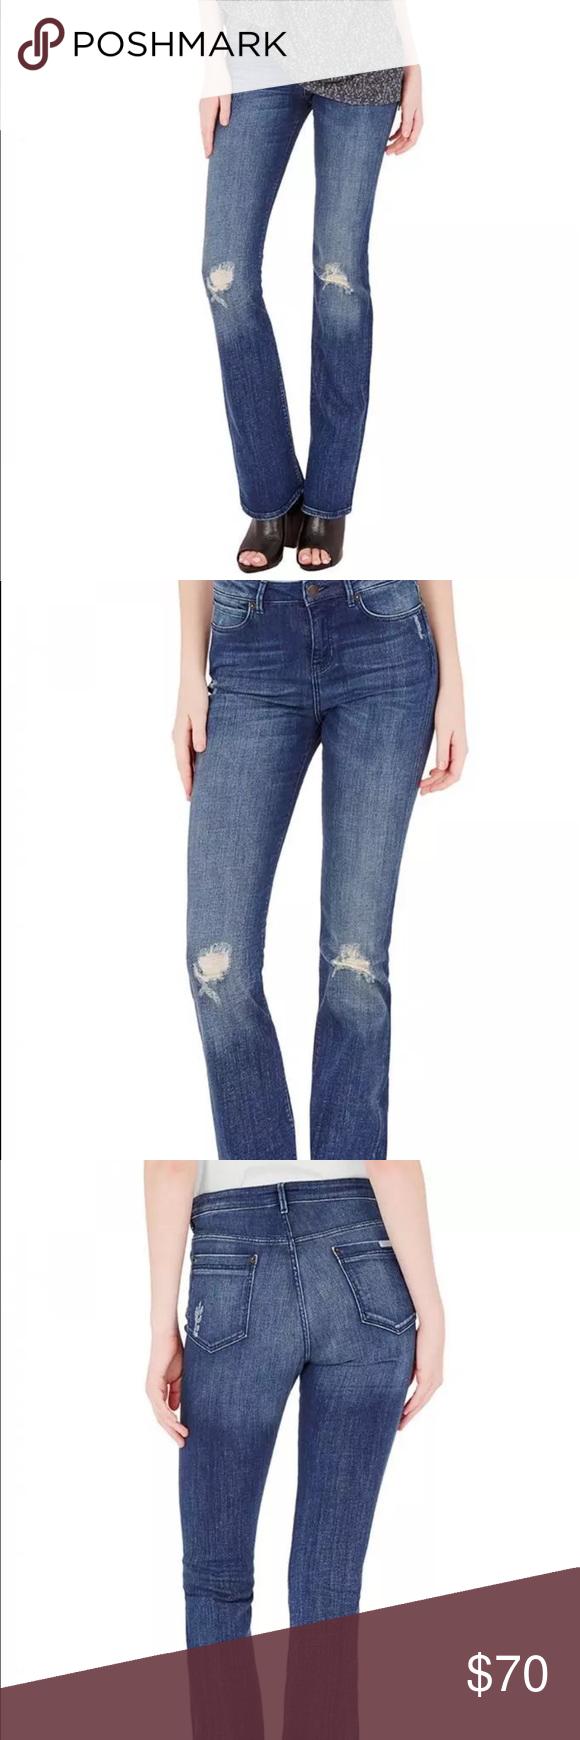 Nwt Sass Bide Mojo Kiko Jeans Hi Rise 26 Clothes Design Distressed Jeans Fashion Design